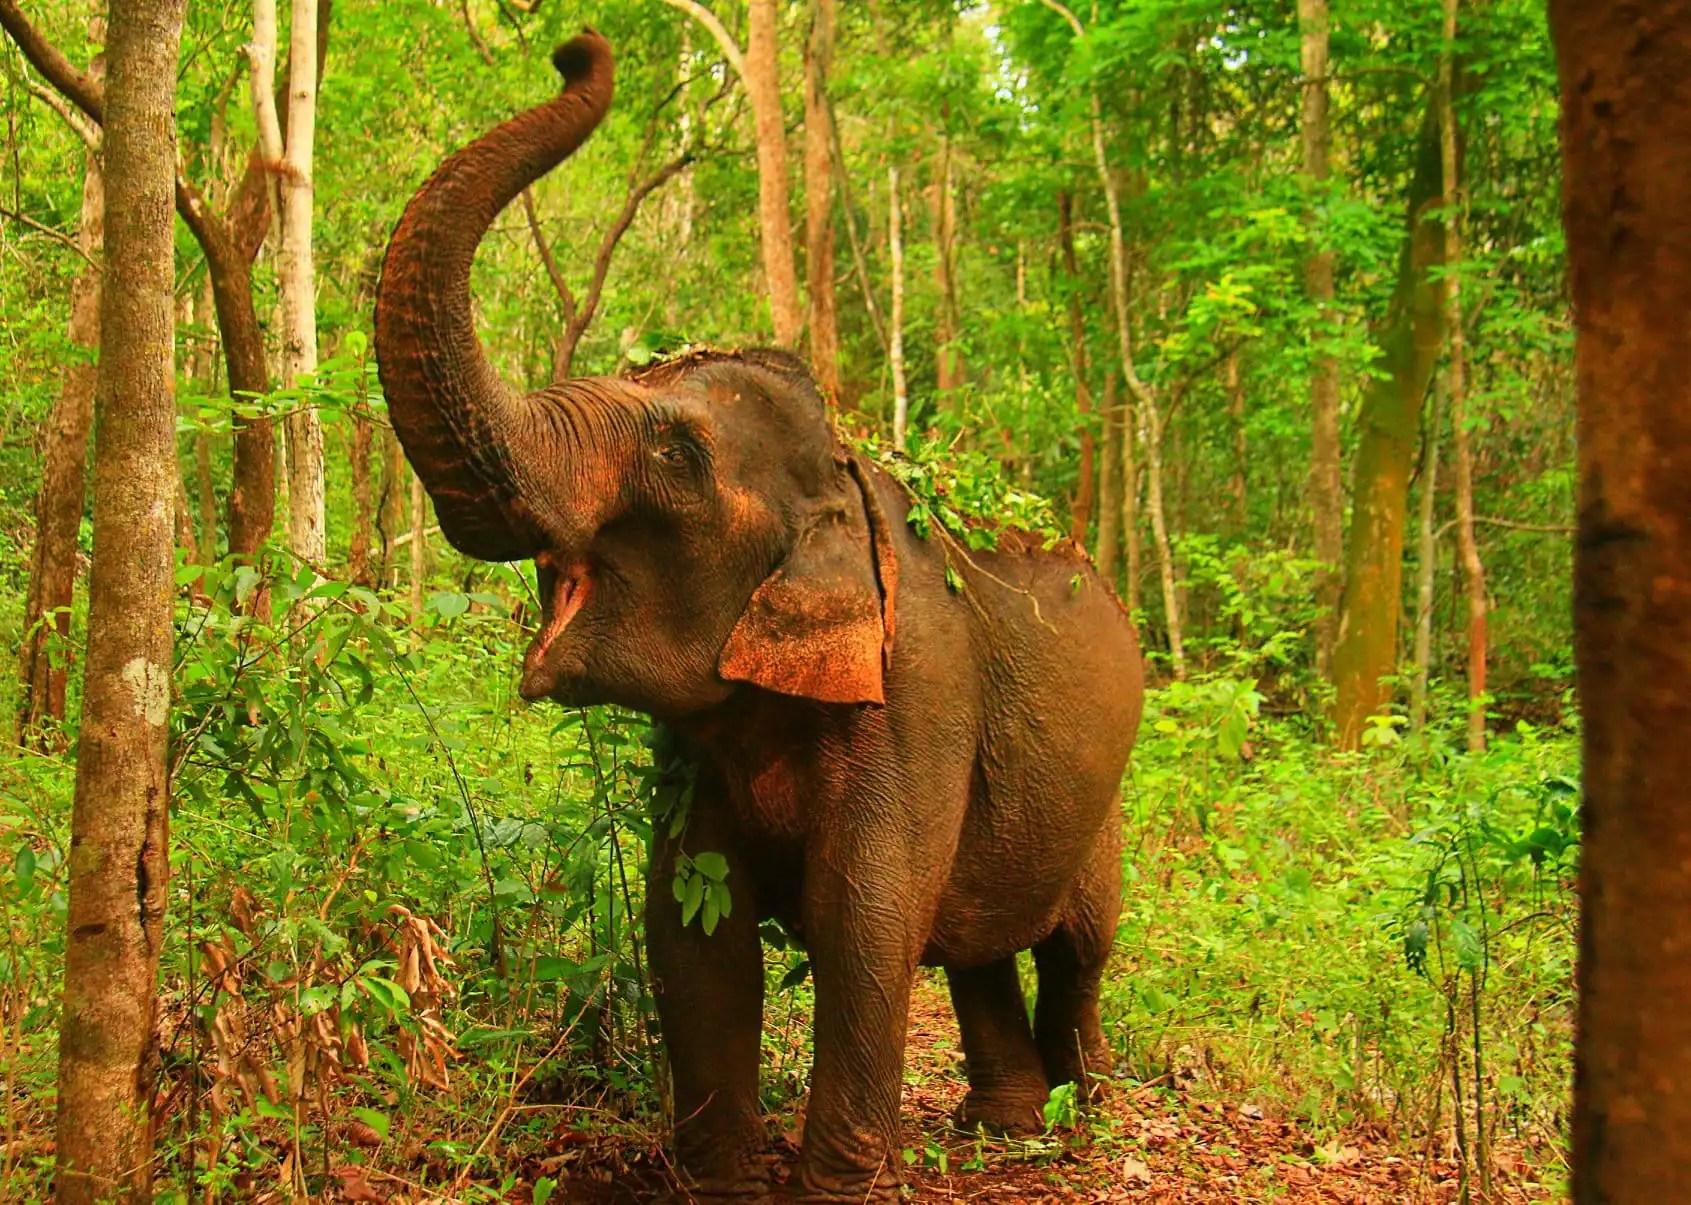 A happy elephant at the sanctuary